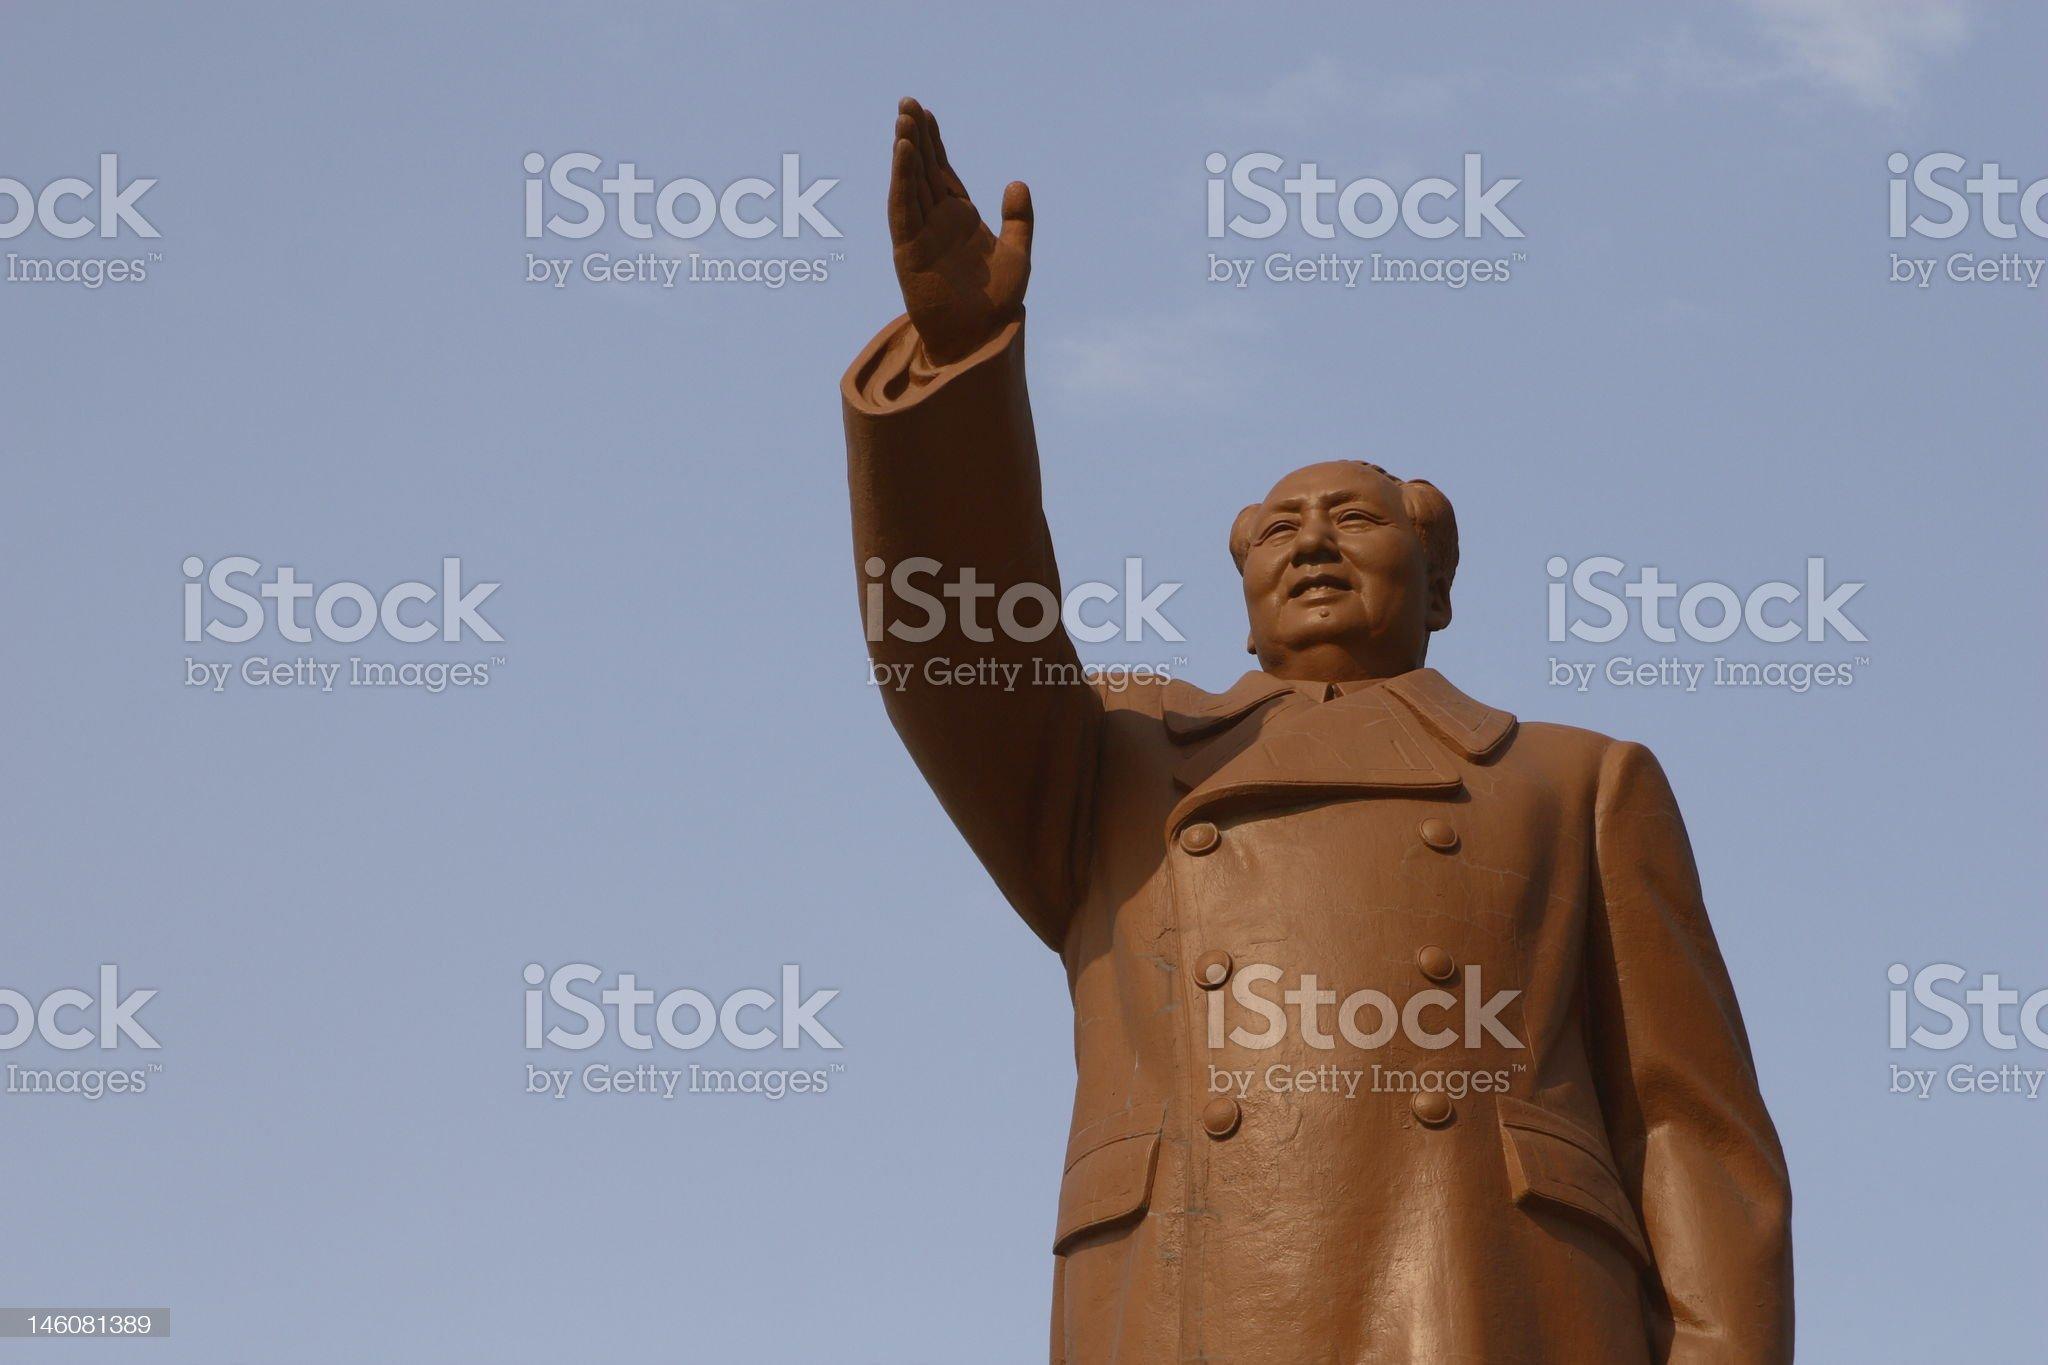 Mao Tse-dung statue royalty-free stock photo